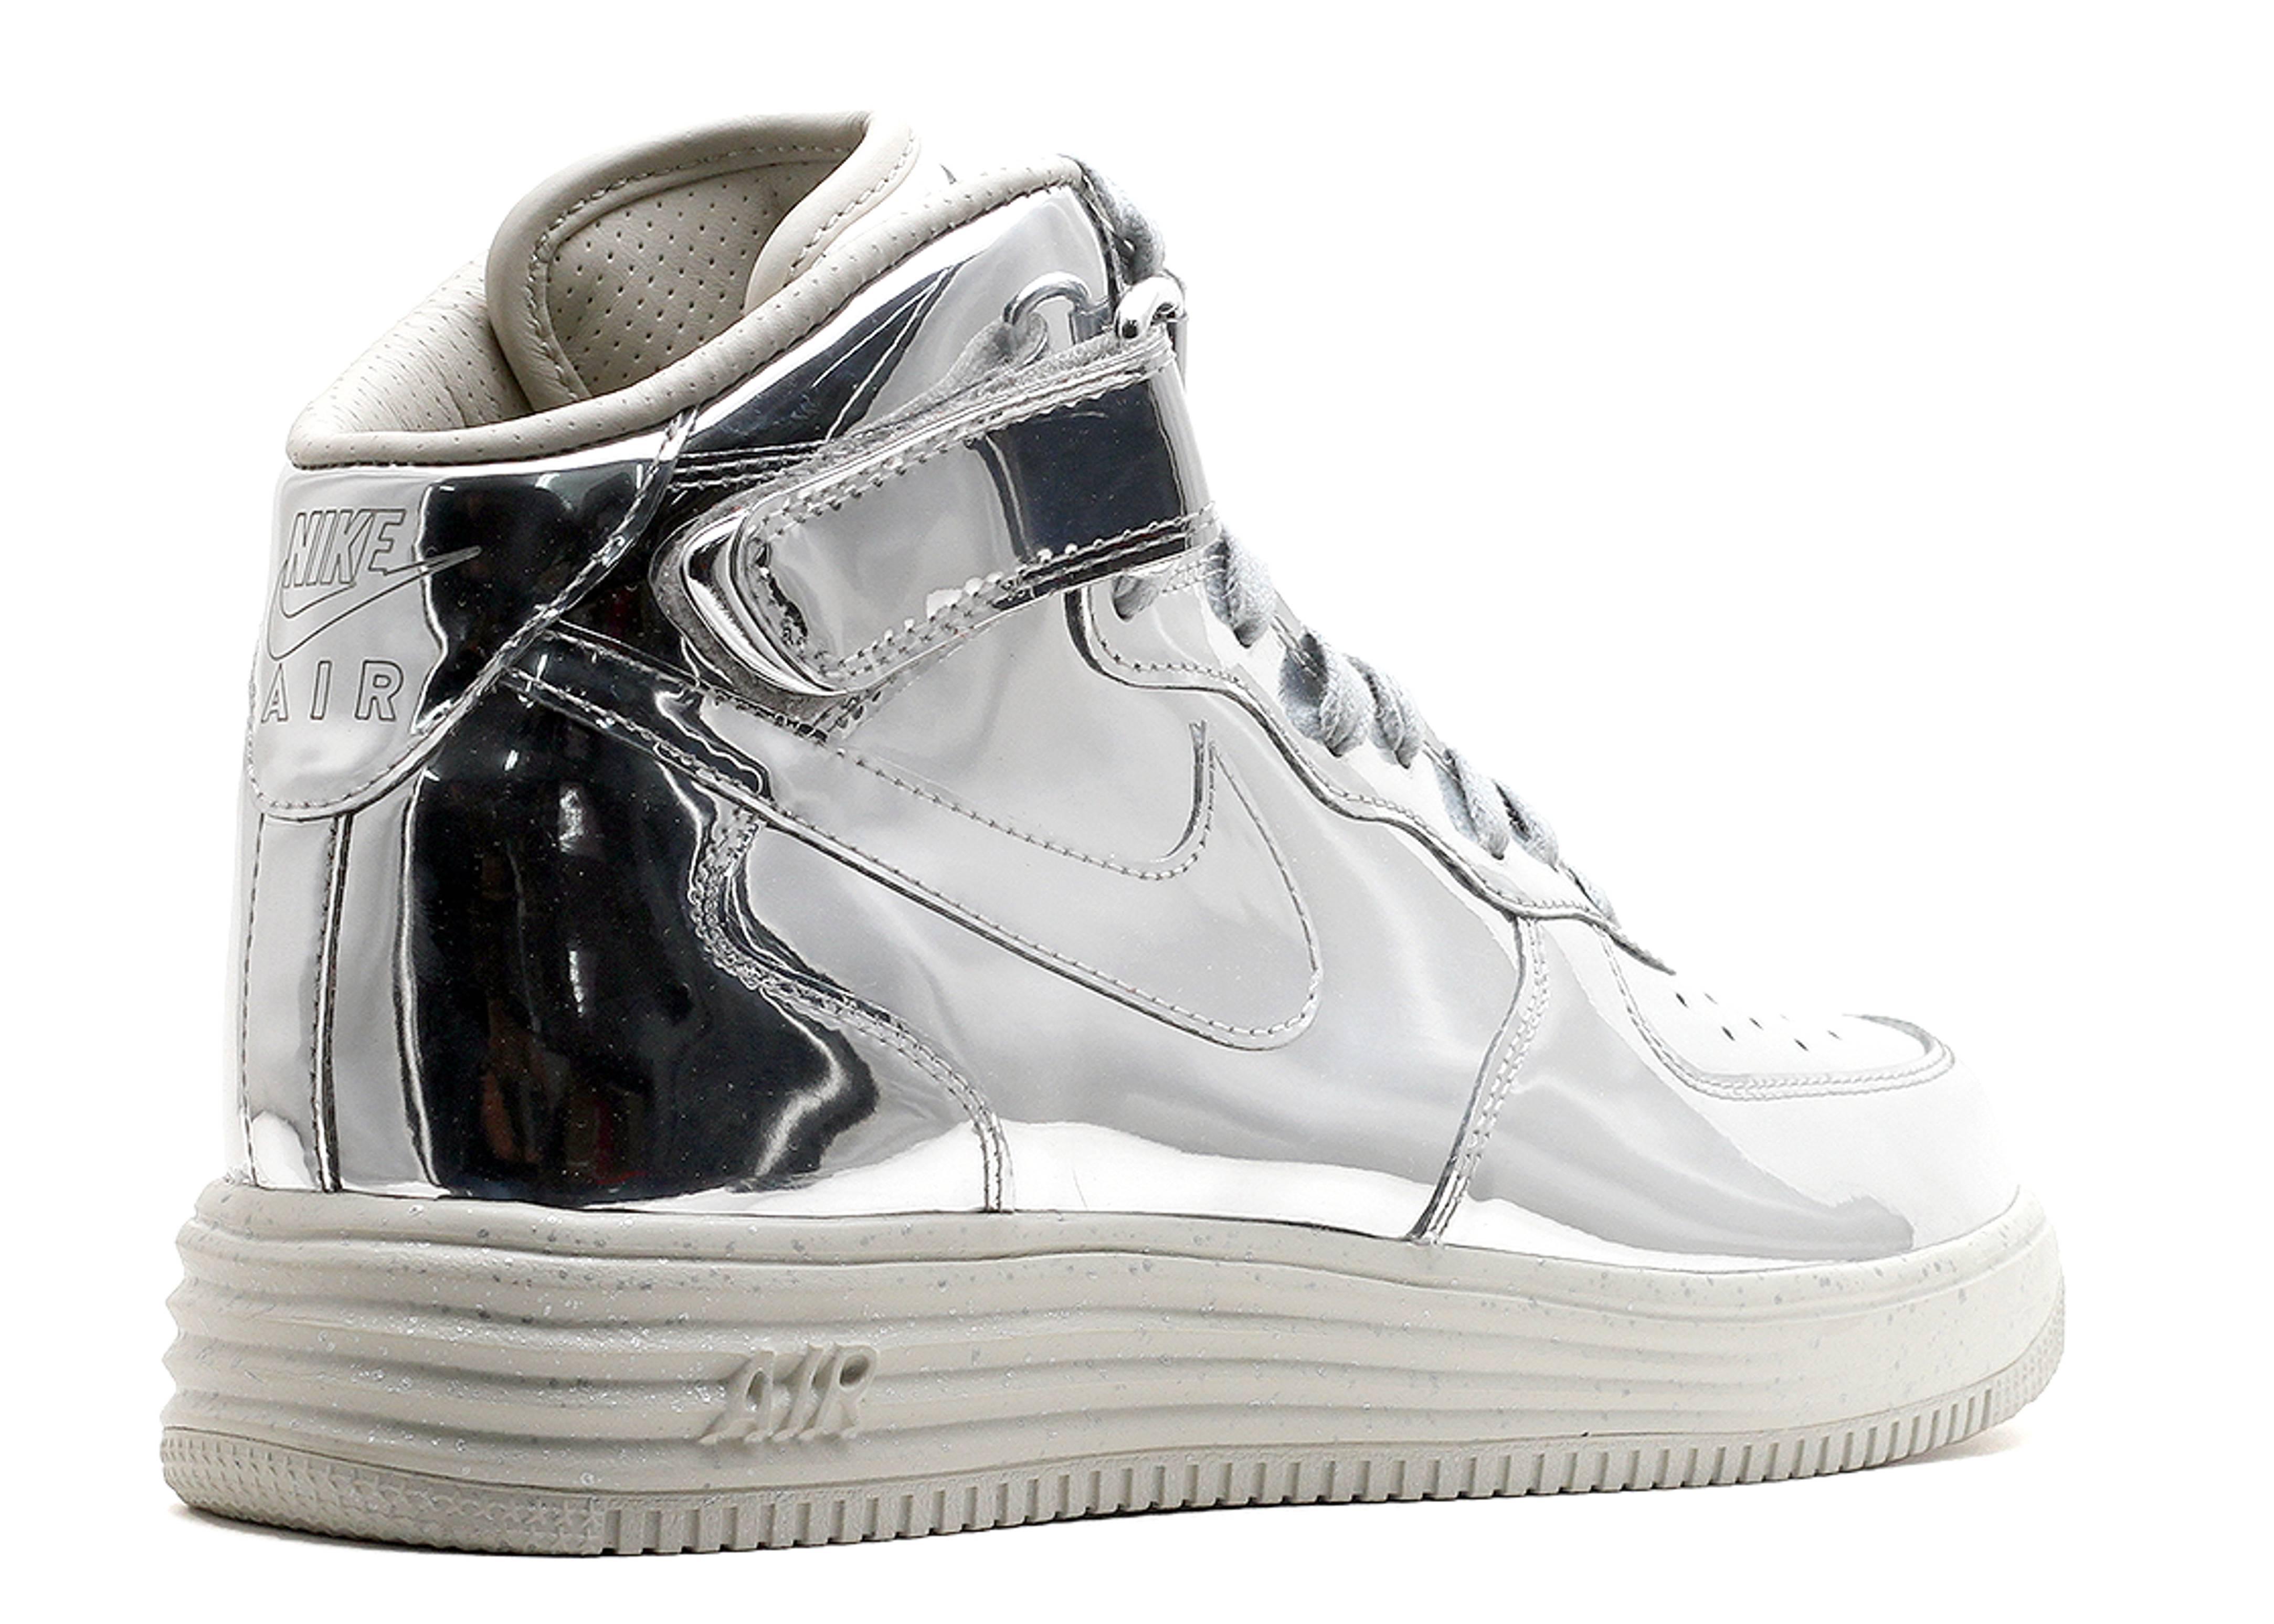 8f27751f ... nike du nike air max 1 liquid silver Available Nike WMNS ...